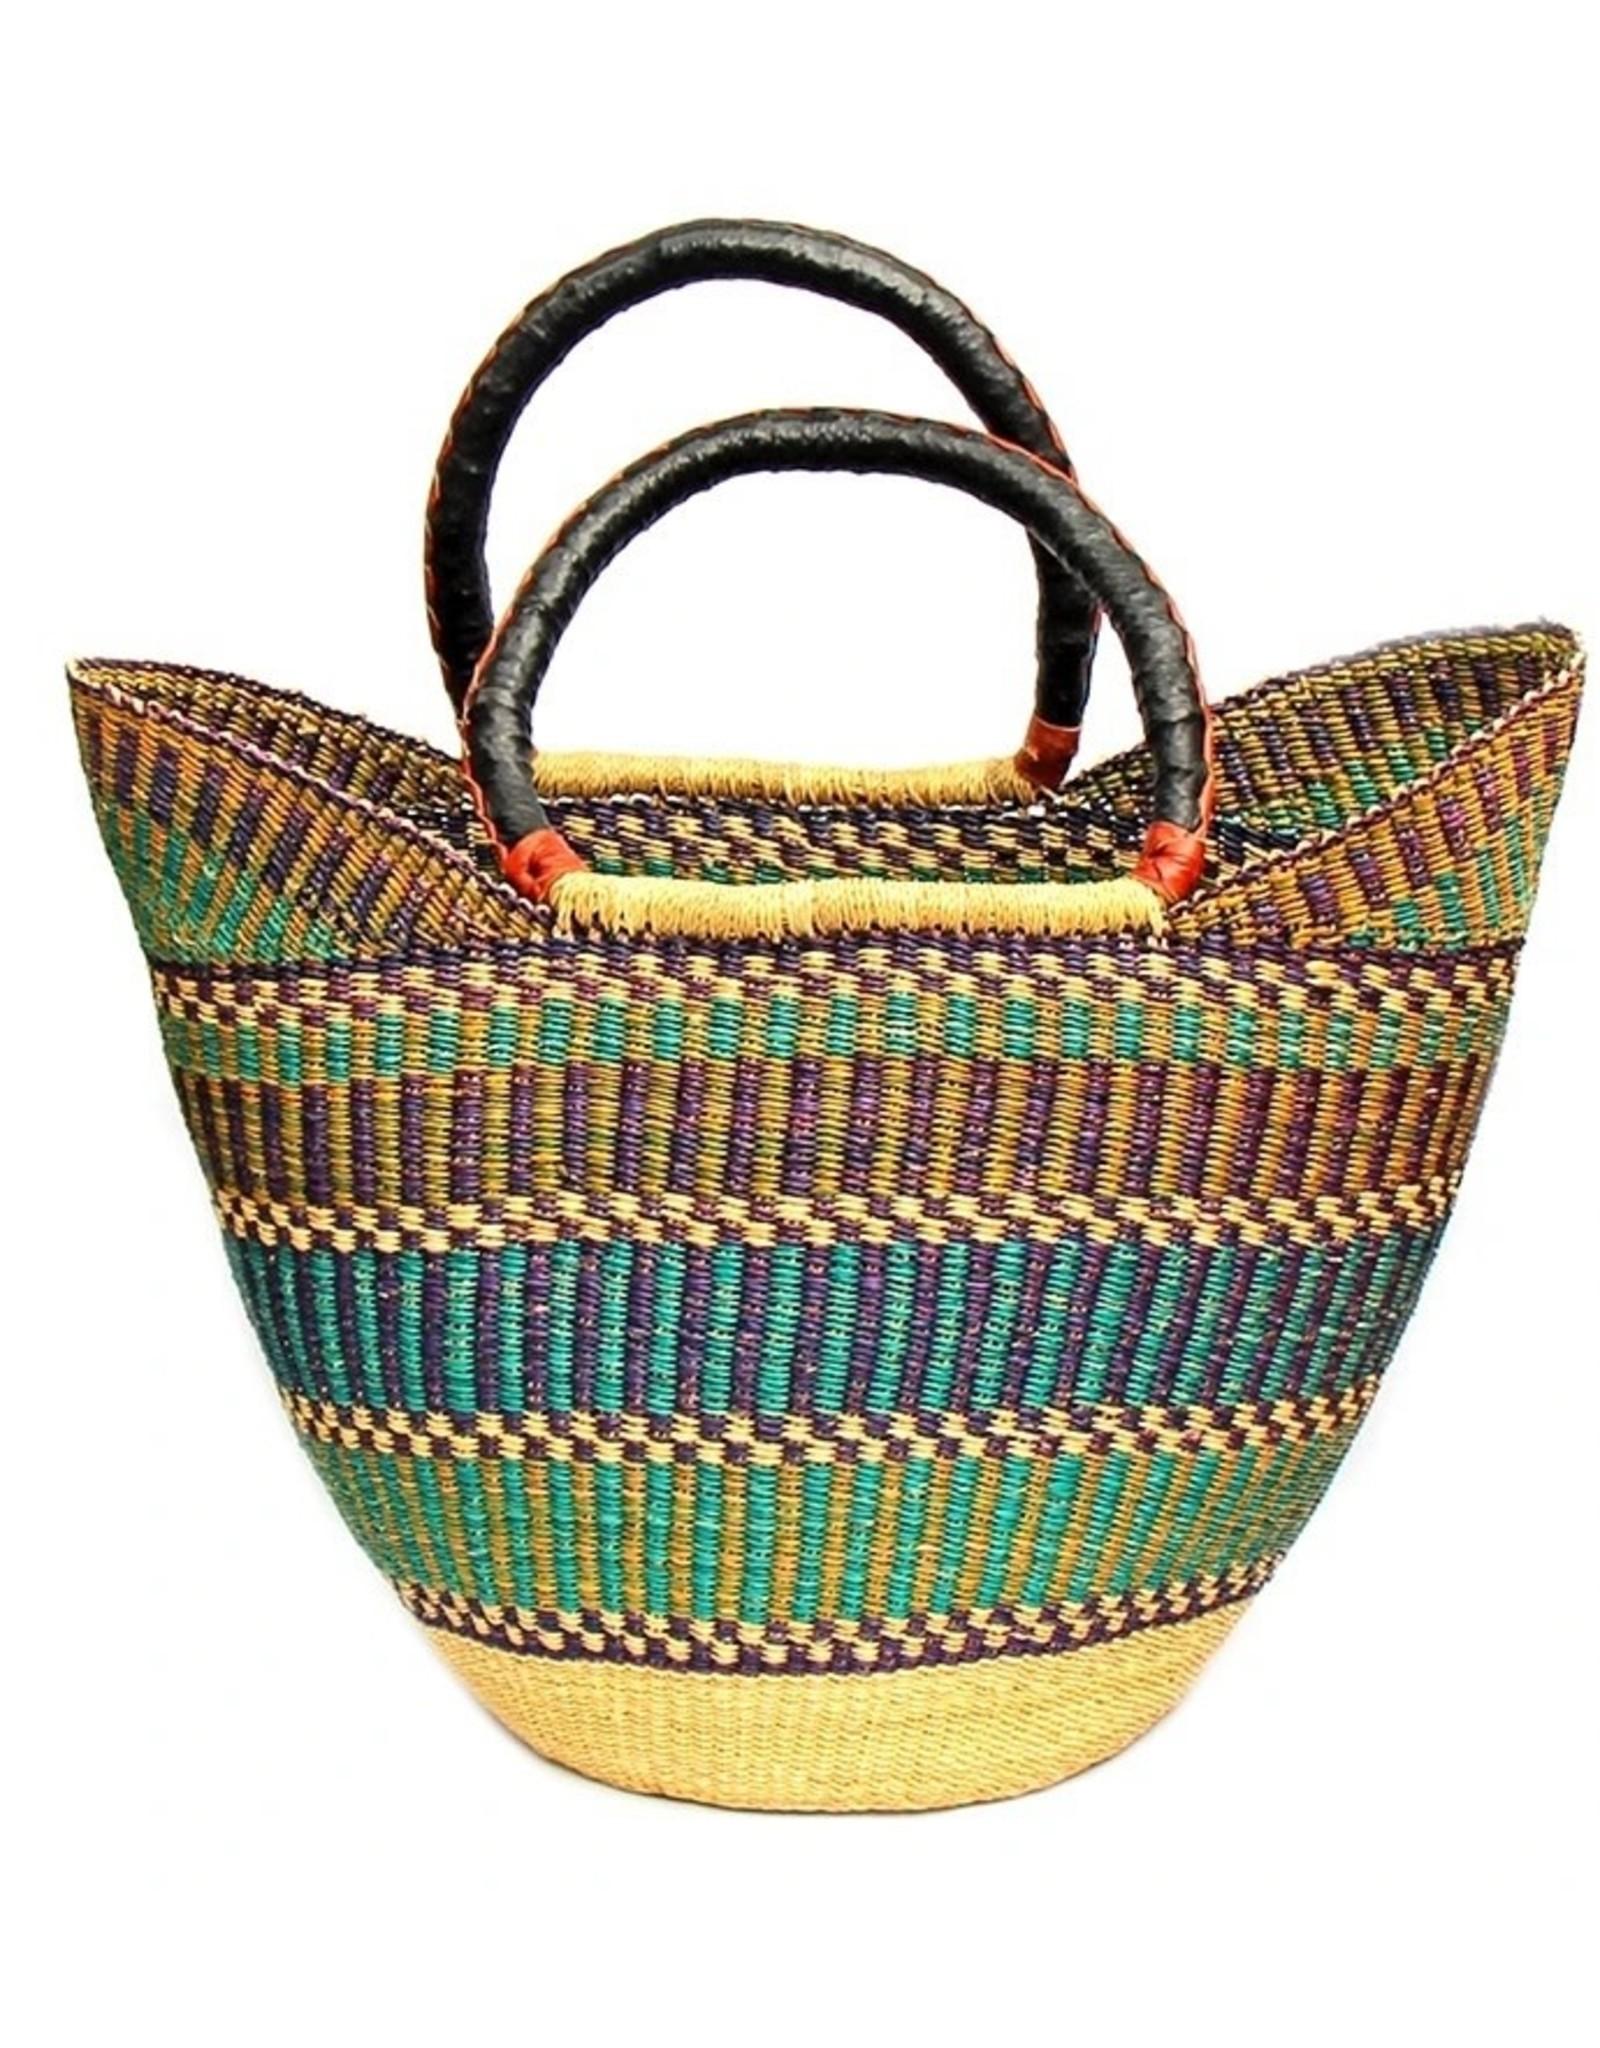 Global Crafts Bolga Tote, Mixed colours. Ghana